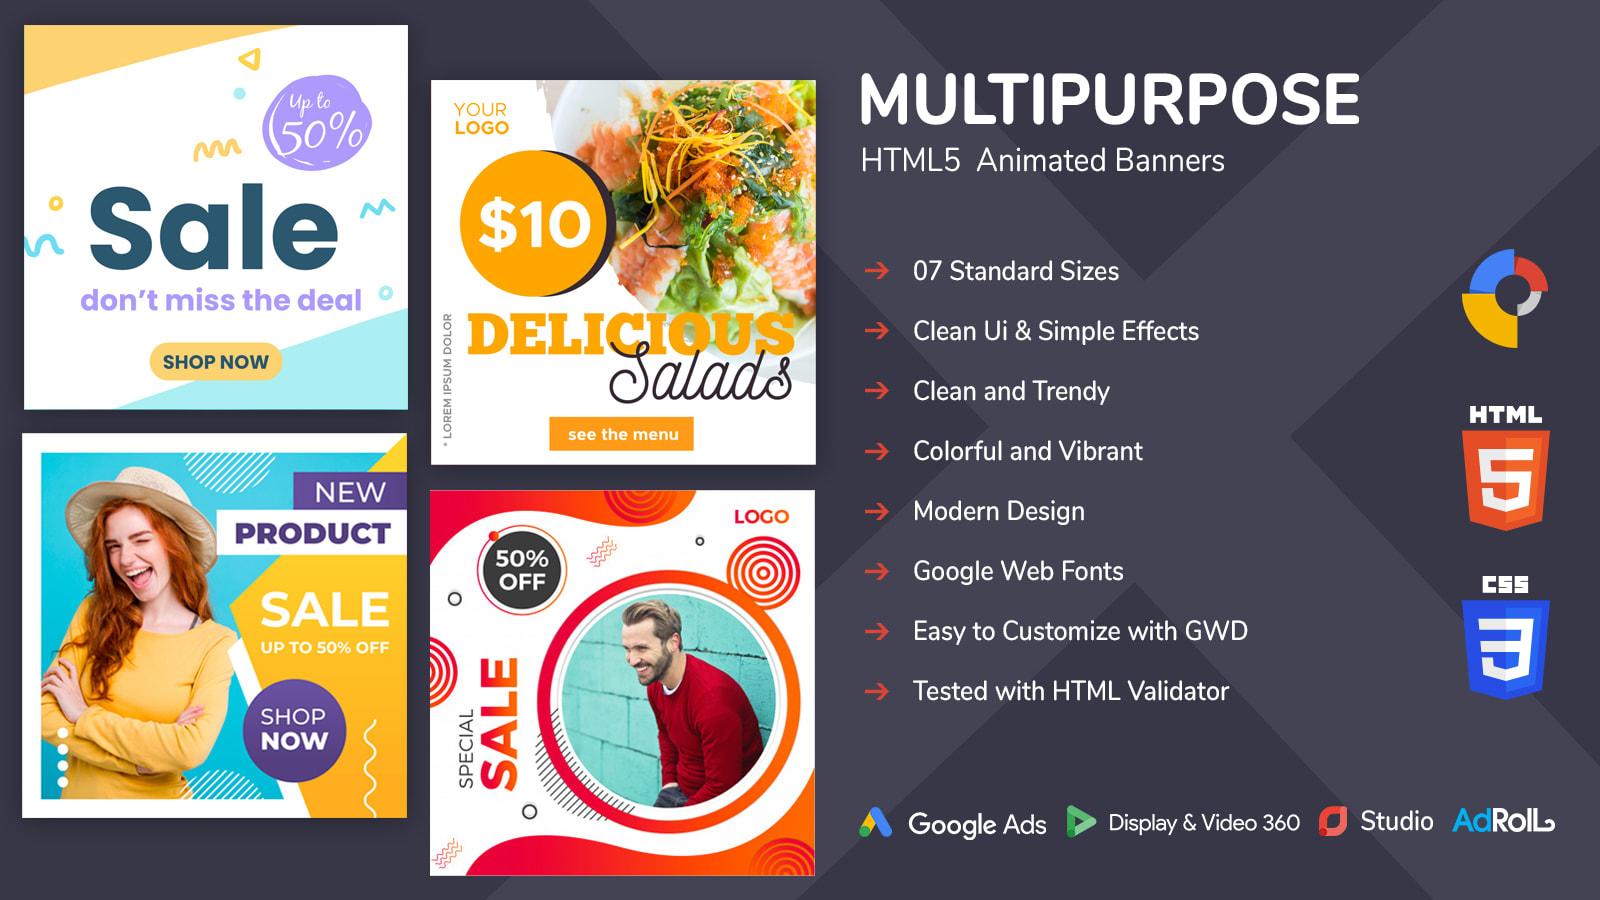 Design Animated Html5 Banner Ads For Google Adwords By Khuramjameel